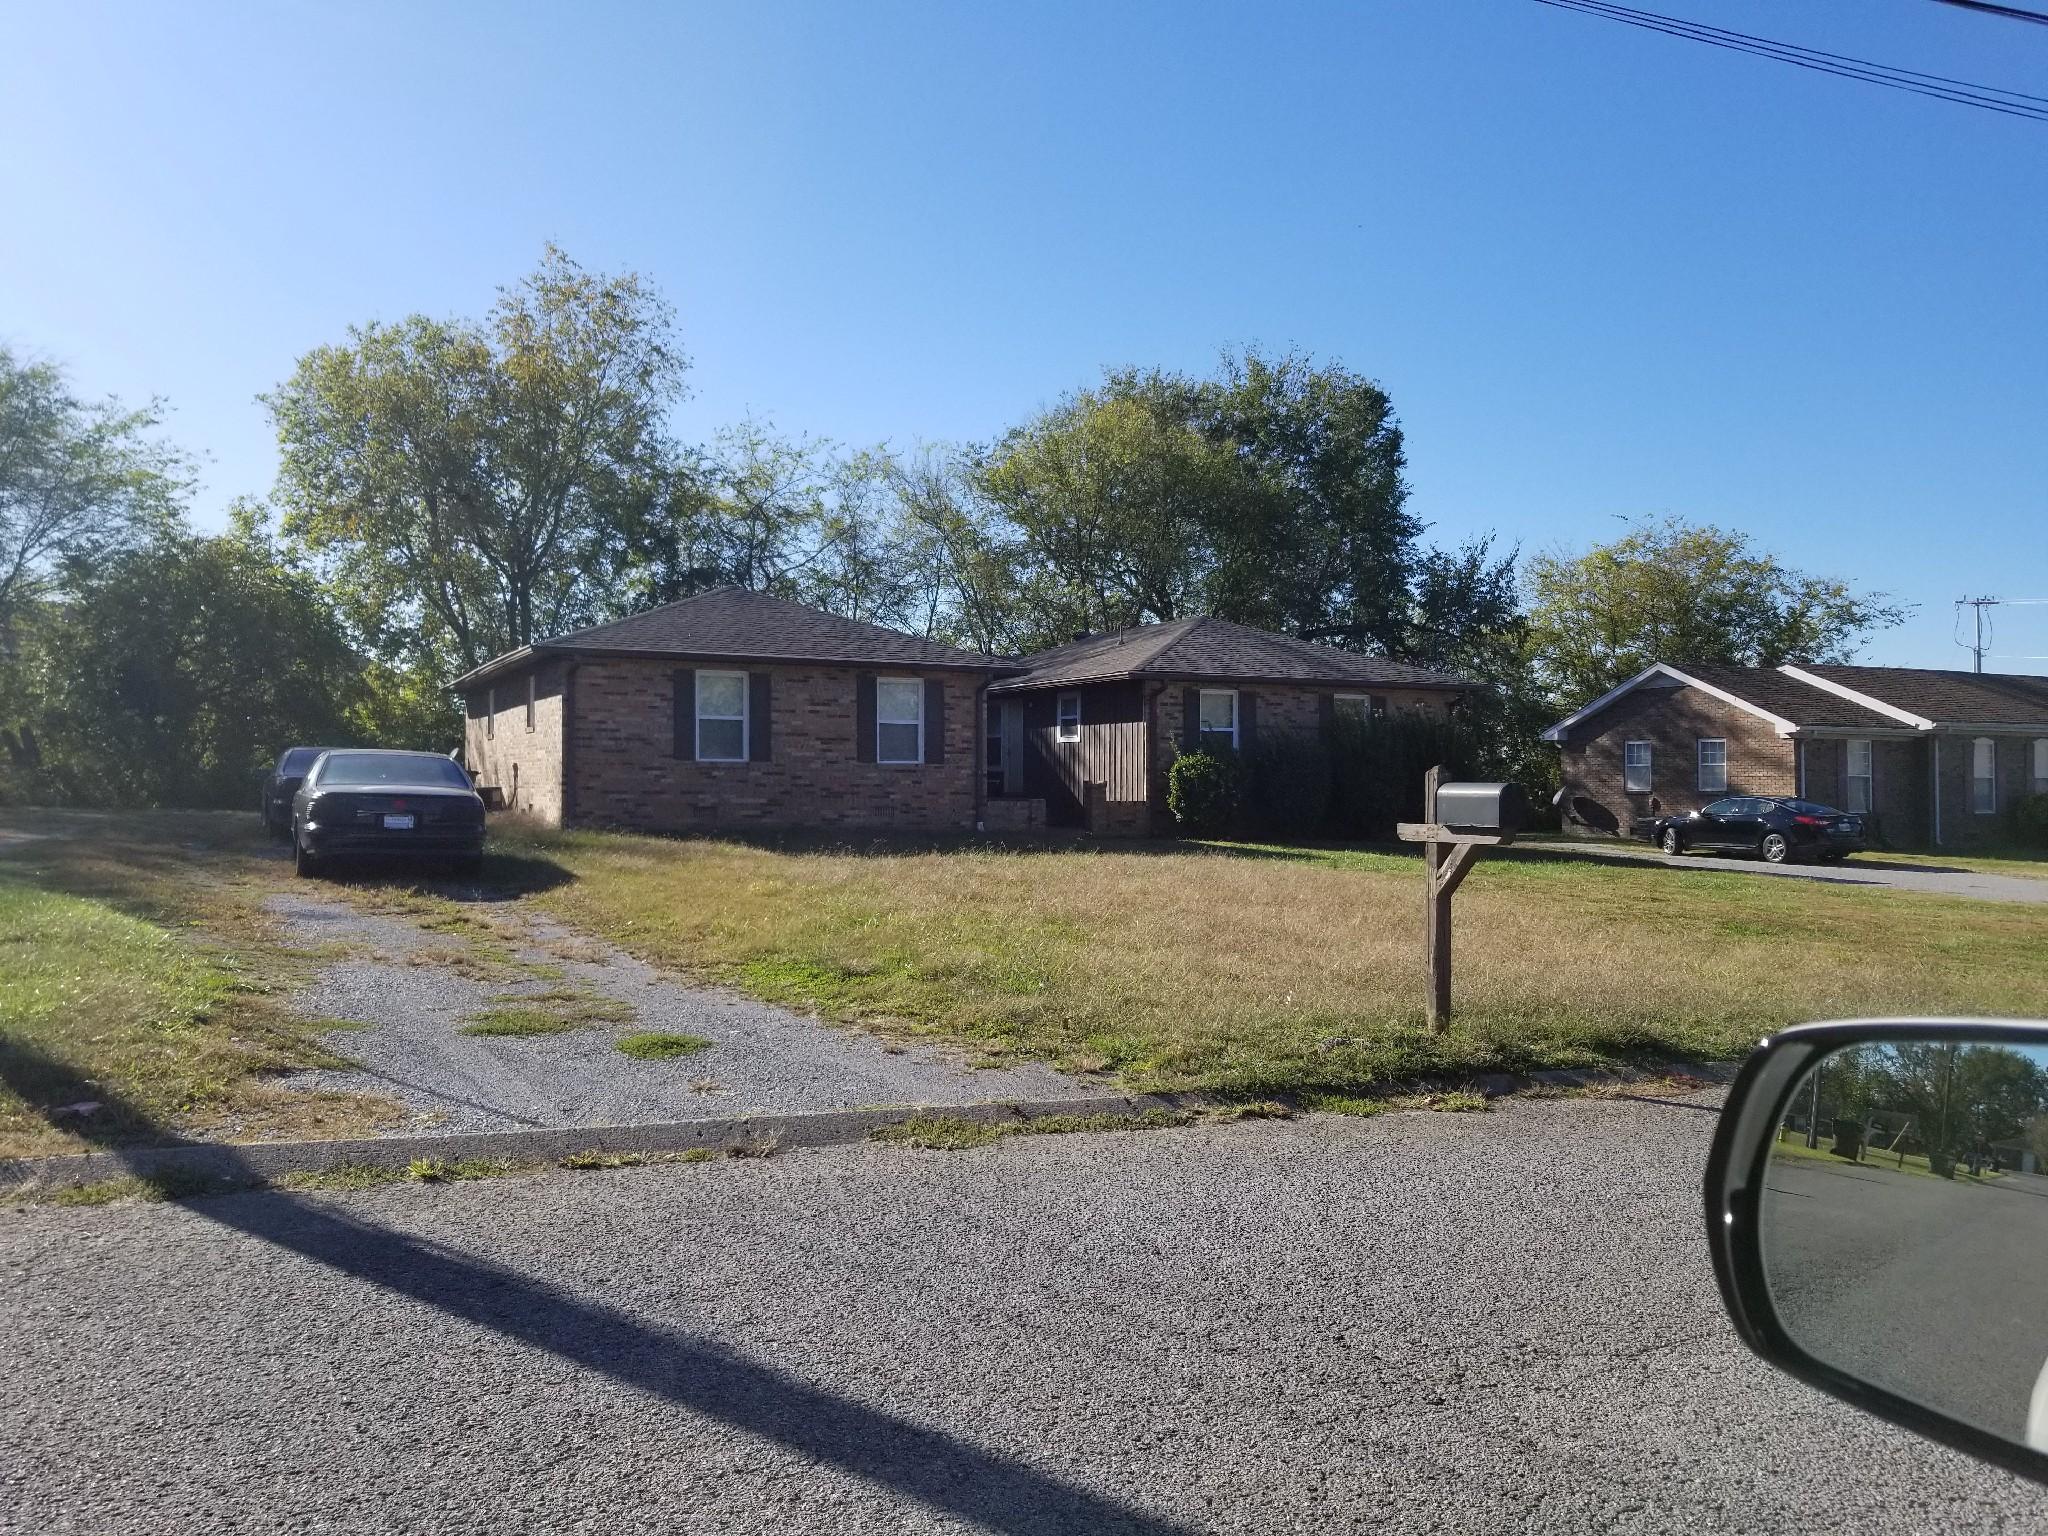 120 Jill St Property Photo - Gallatin, TN real estate listing